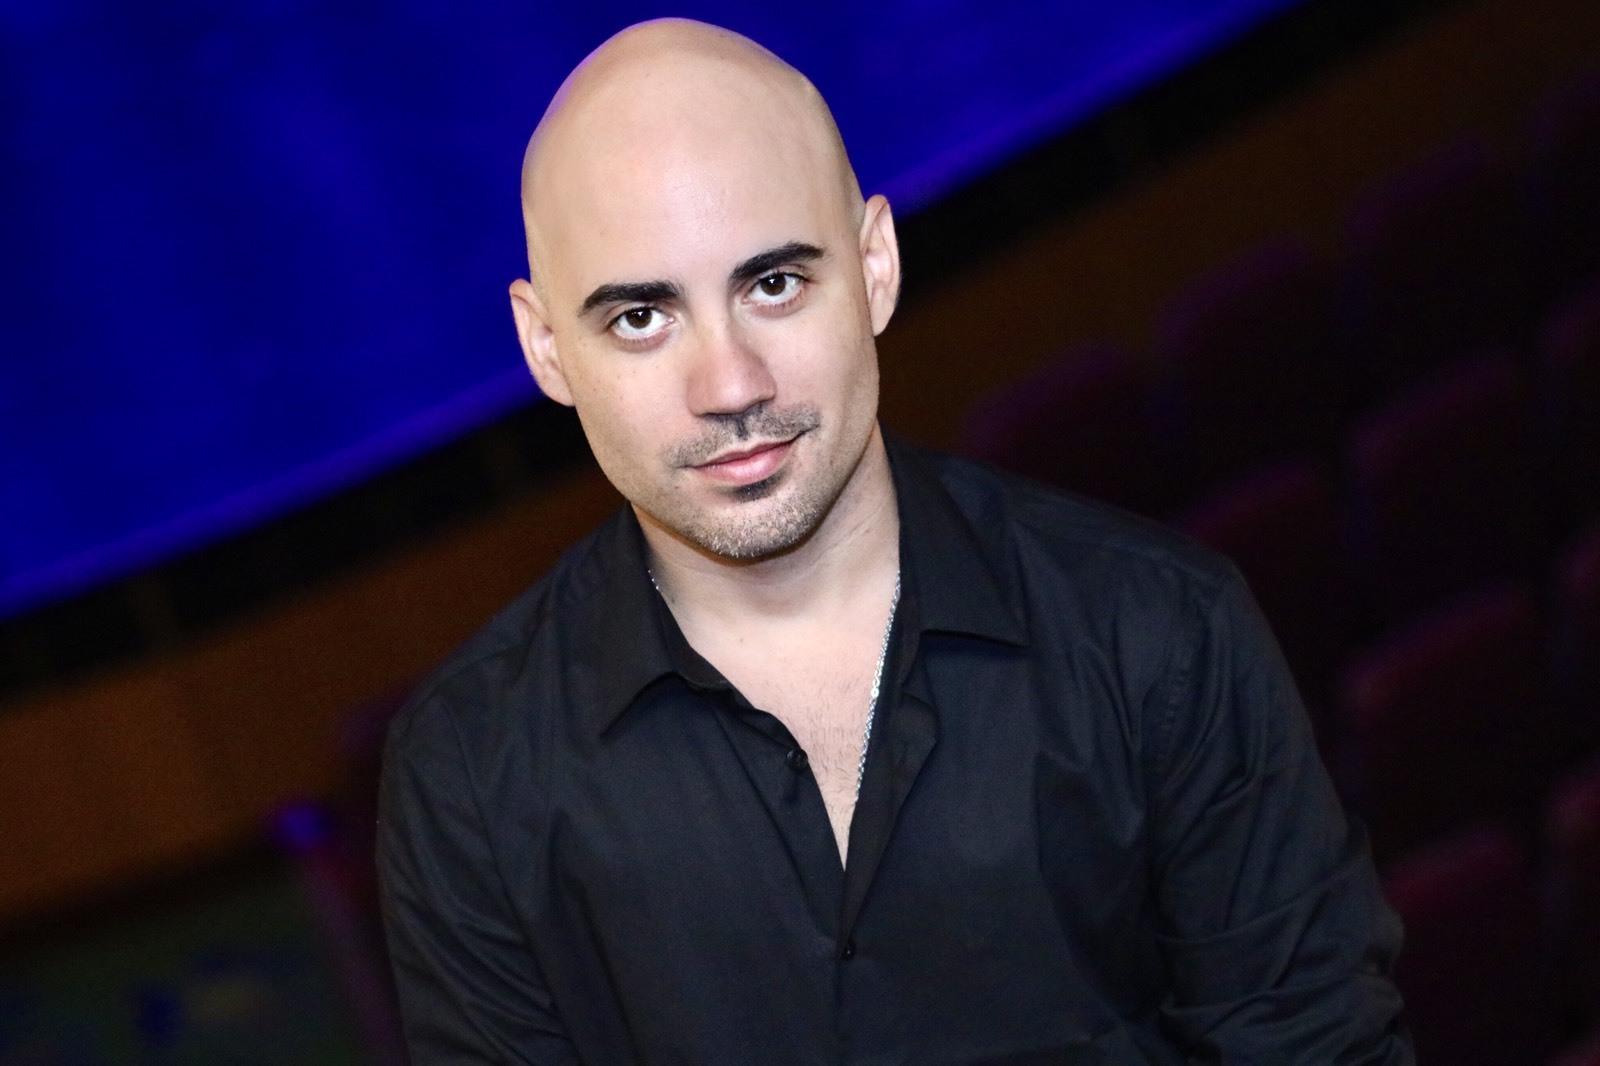 Pablo Aragona